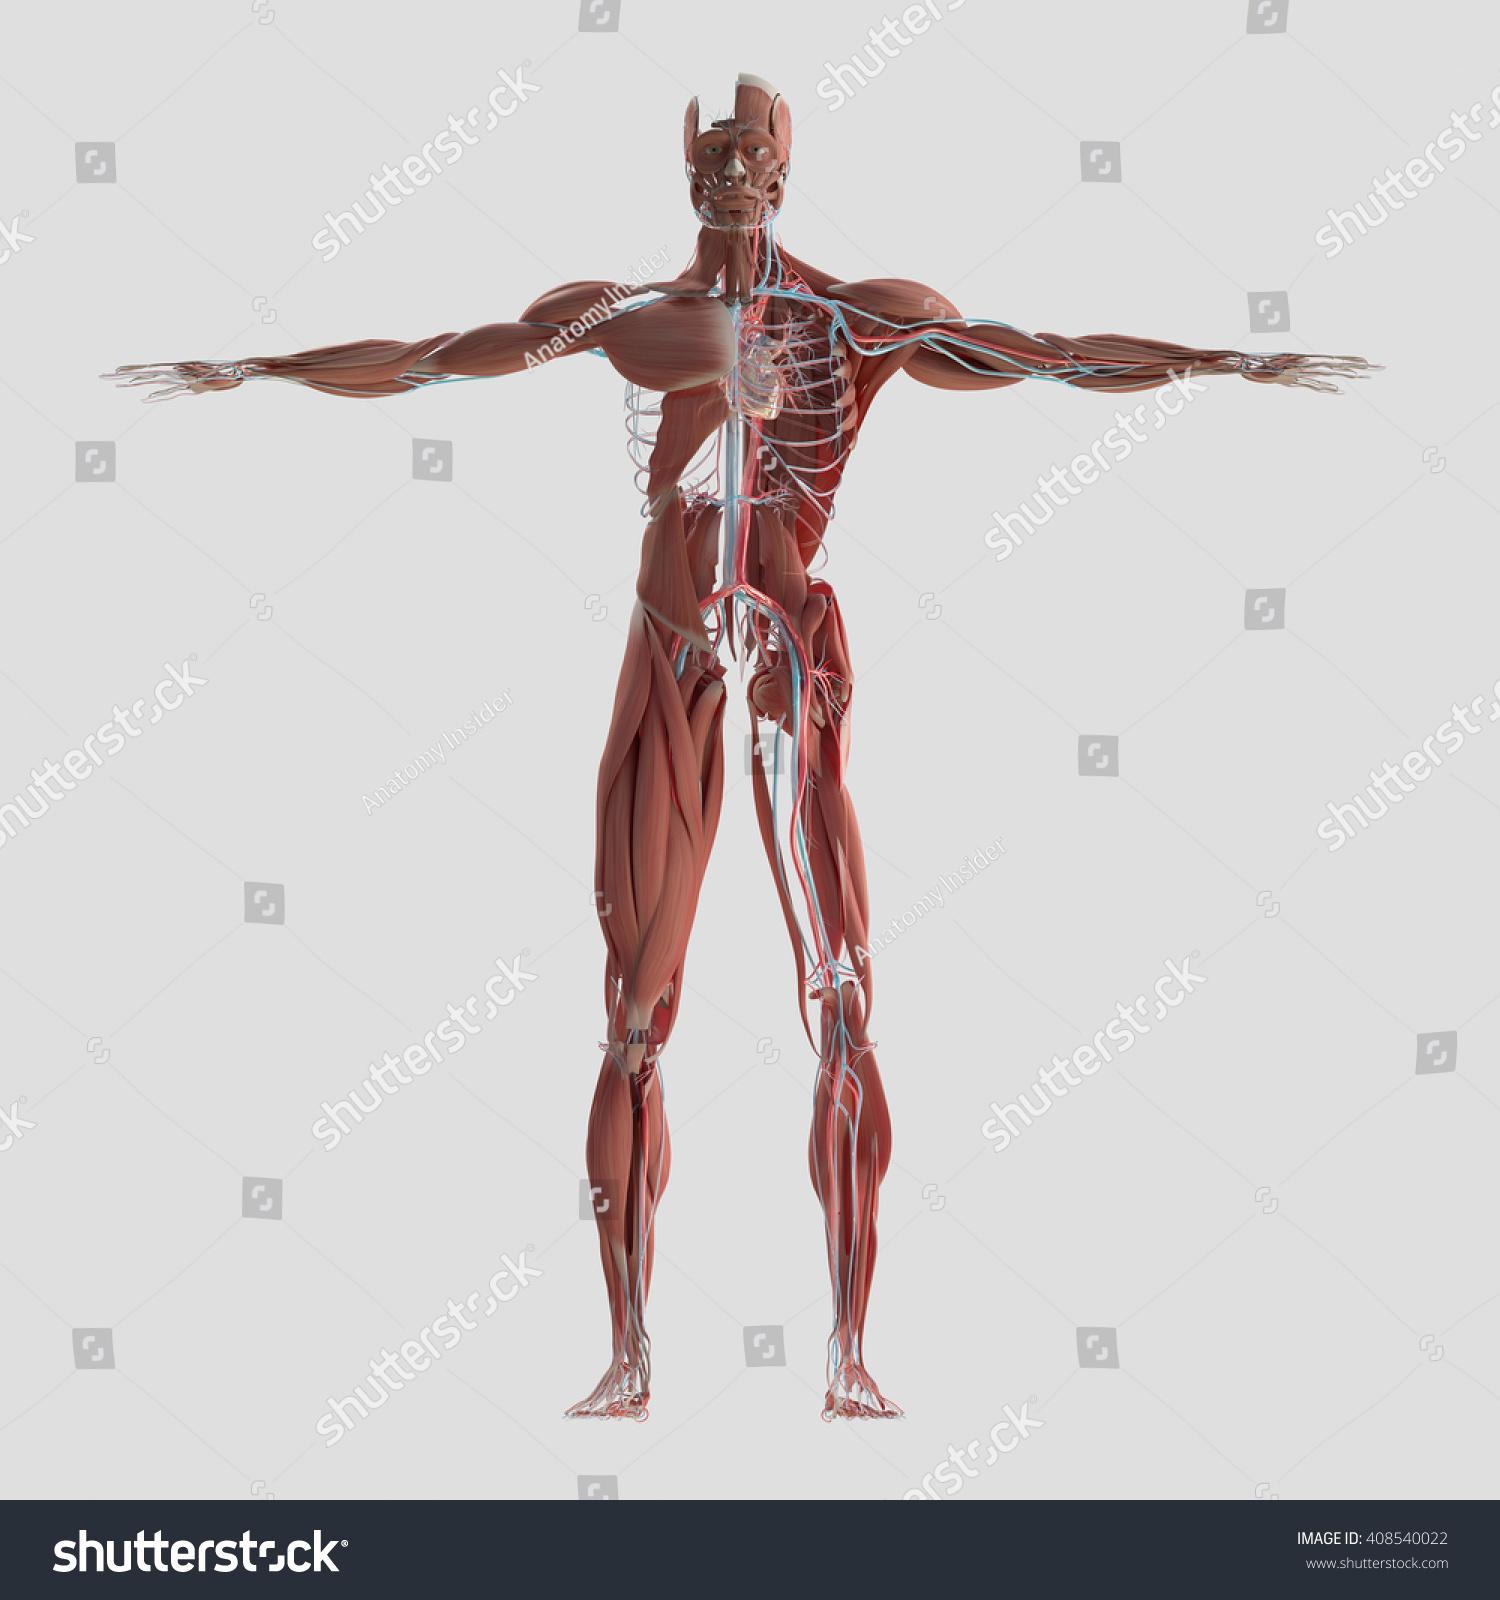 Human Anatomy Body 3 D Illustration Muscular Stock Illustration ...